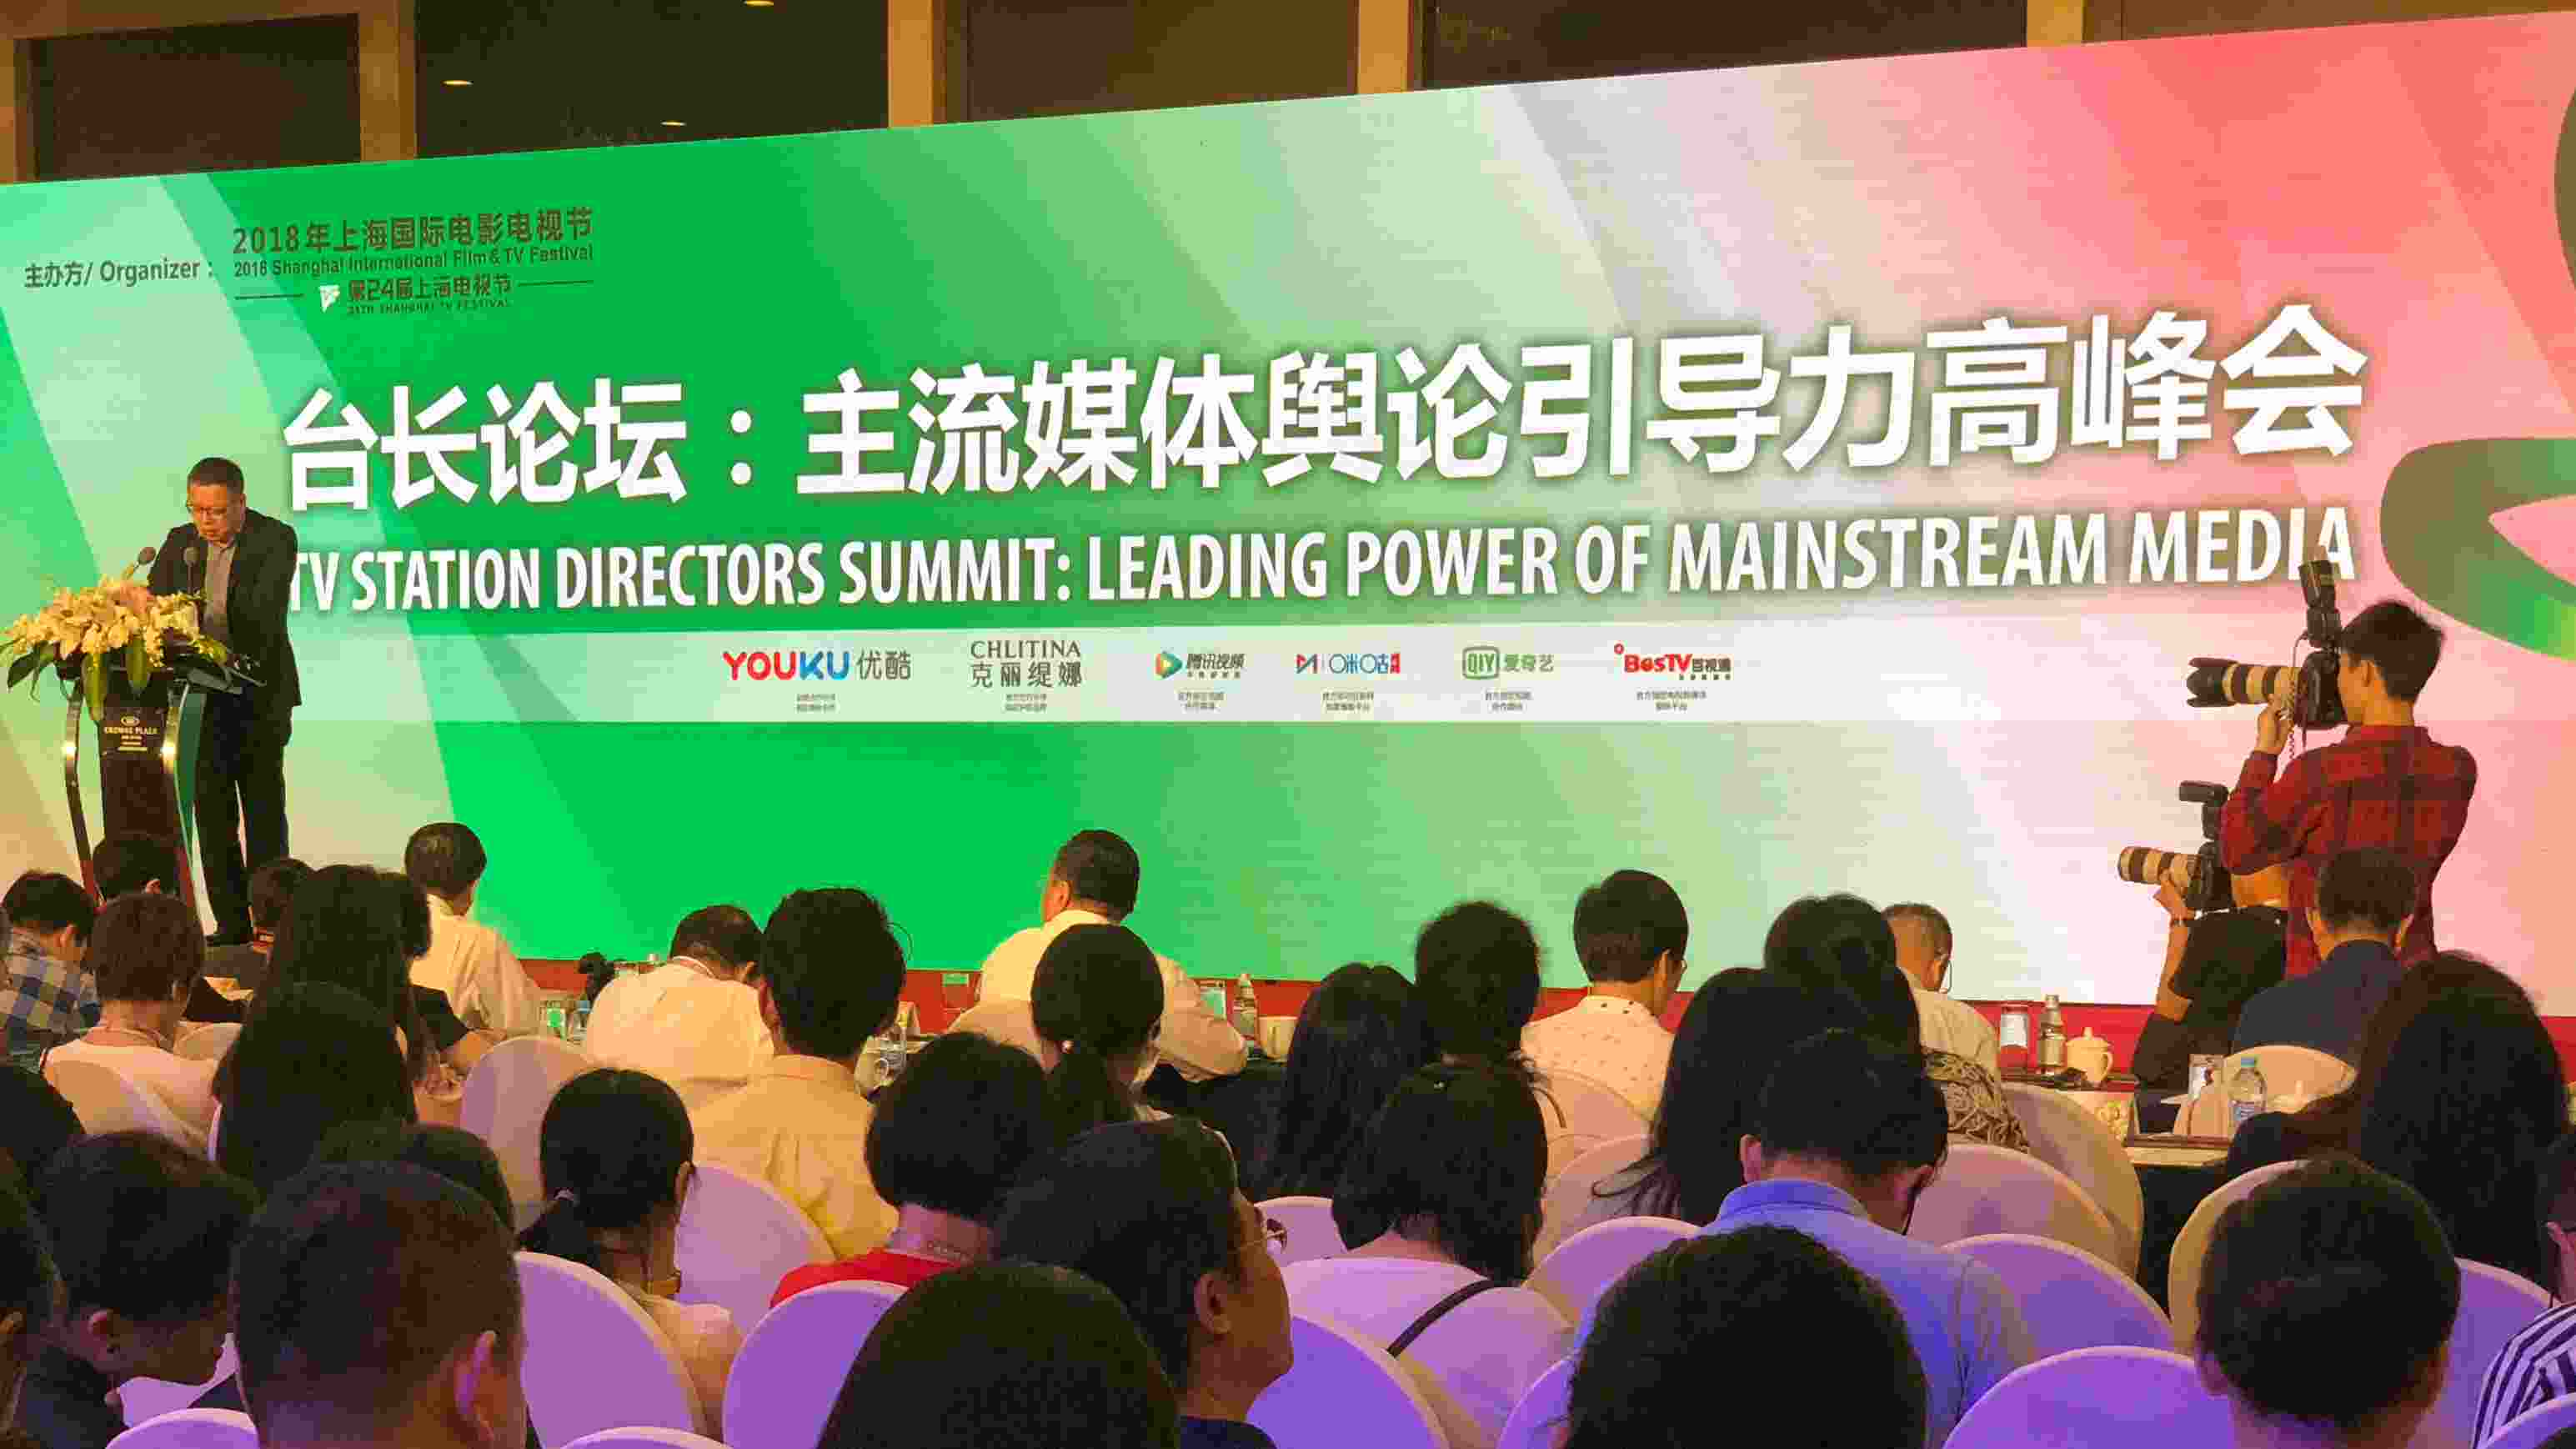 24th Shanghai TV festival kicks off with directors' summit